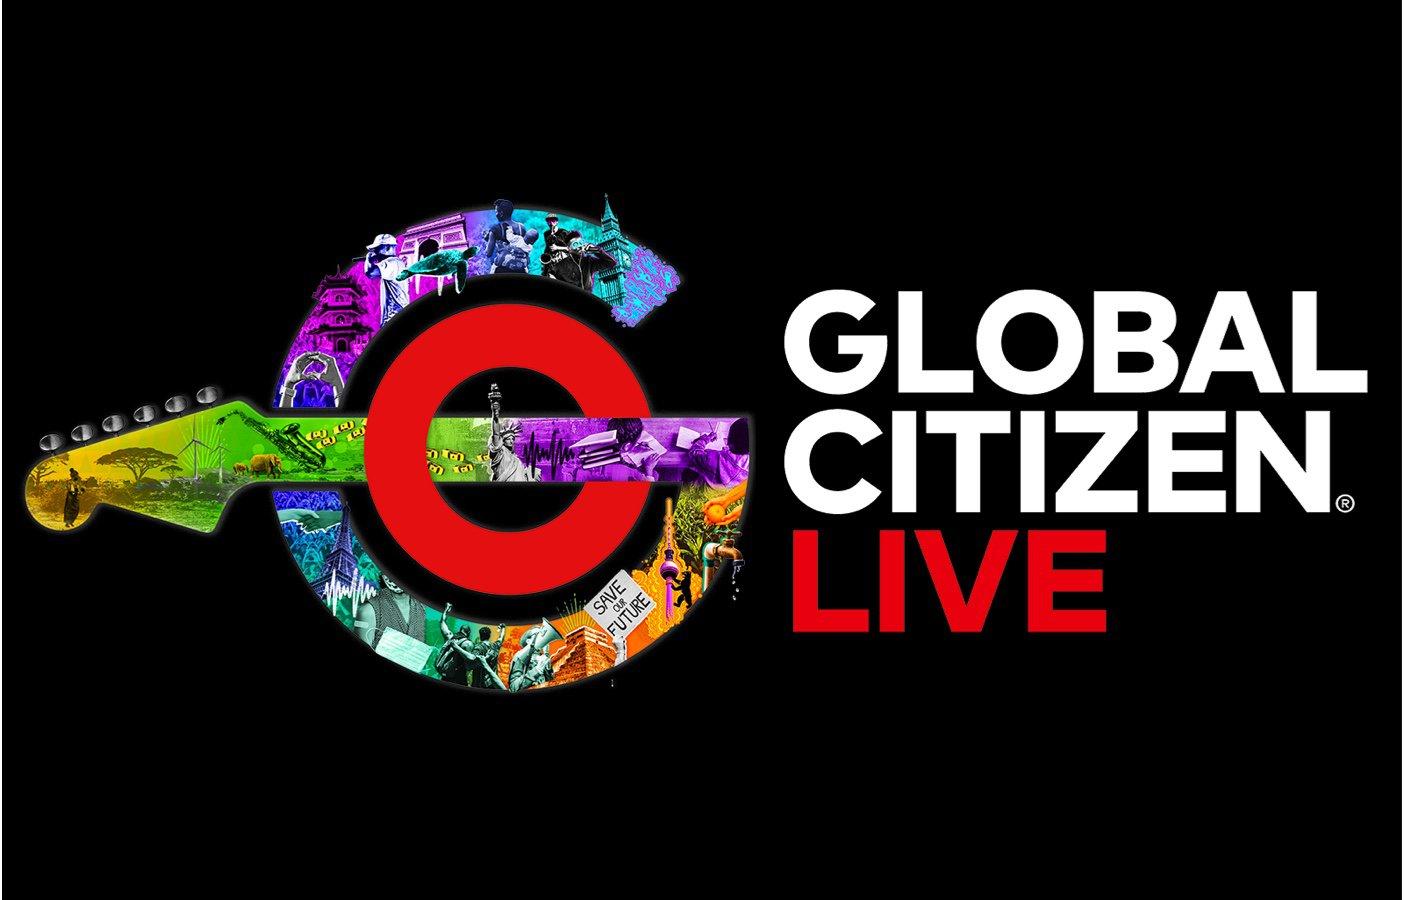 global-citizen-live.jpg